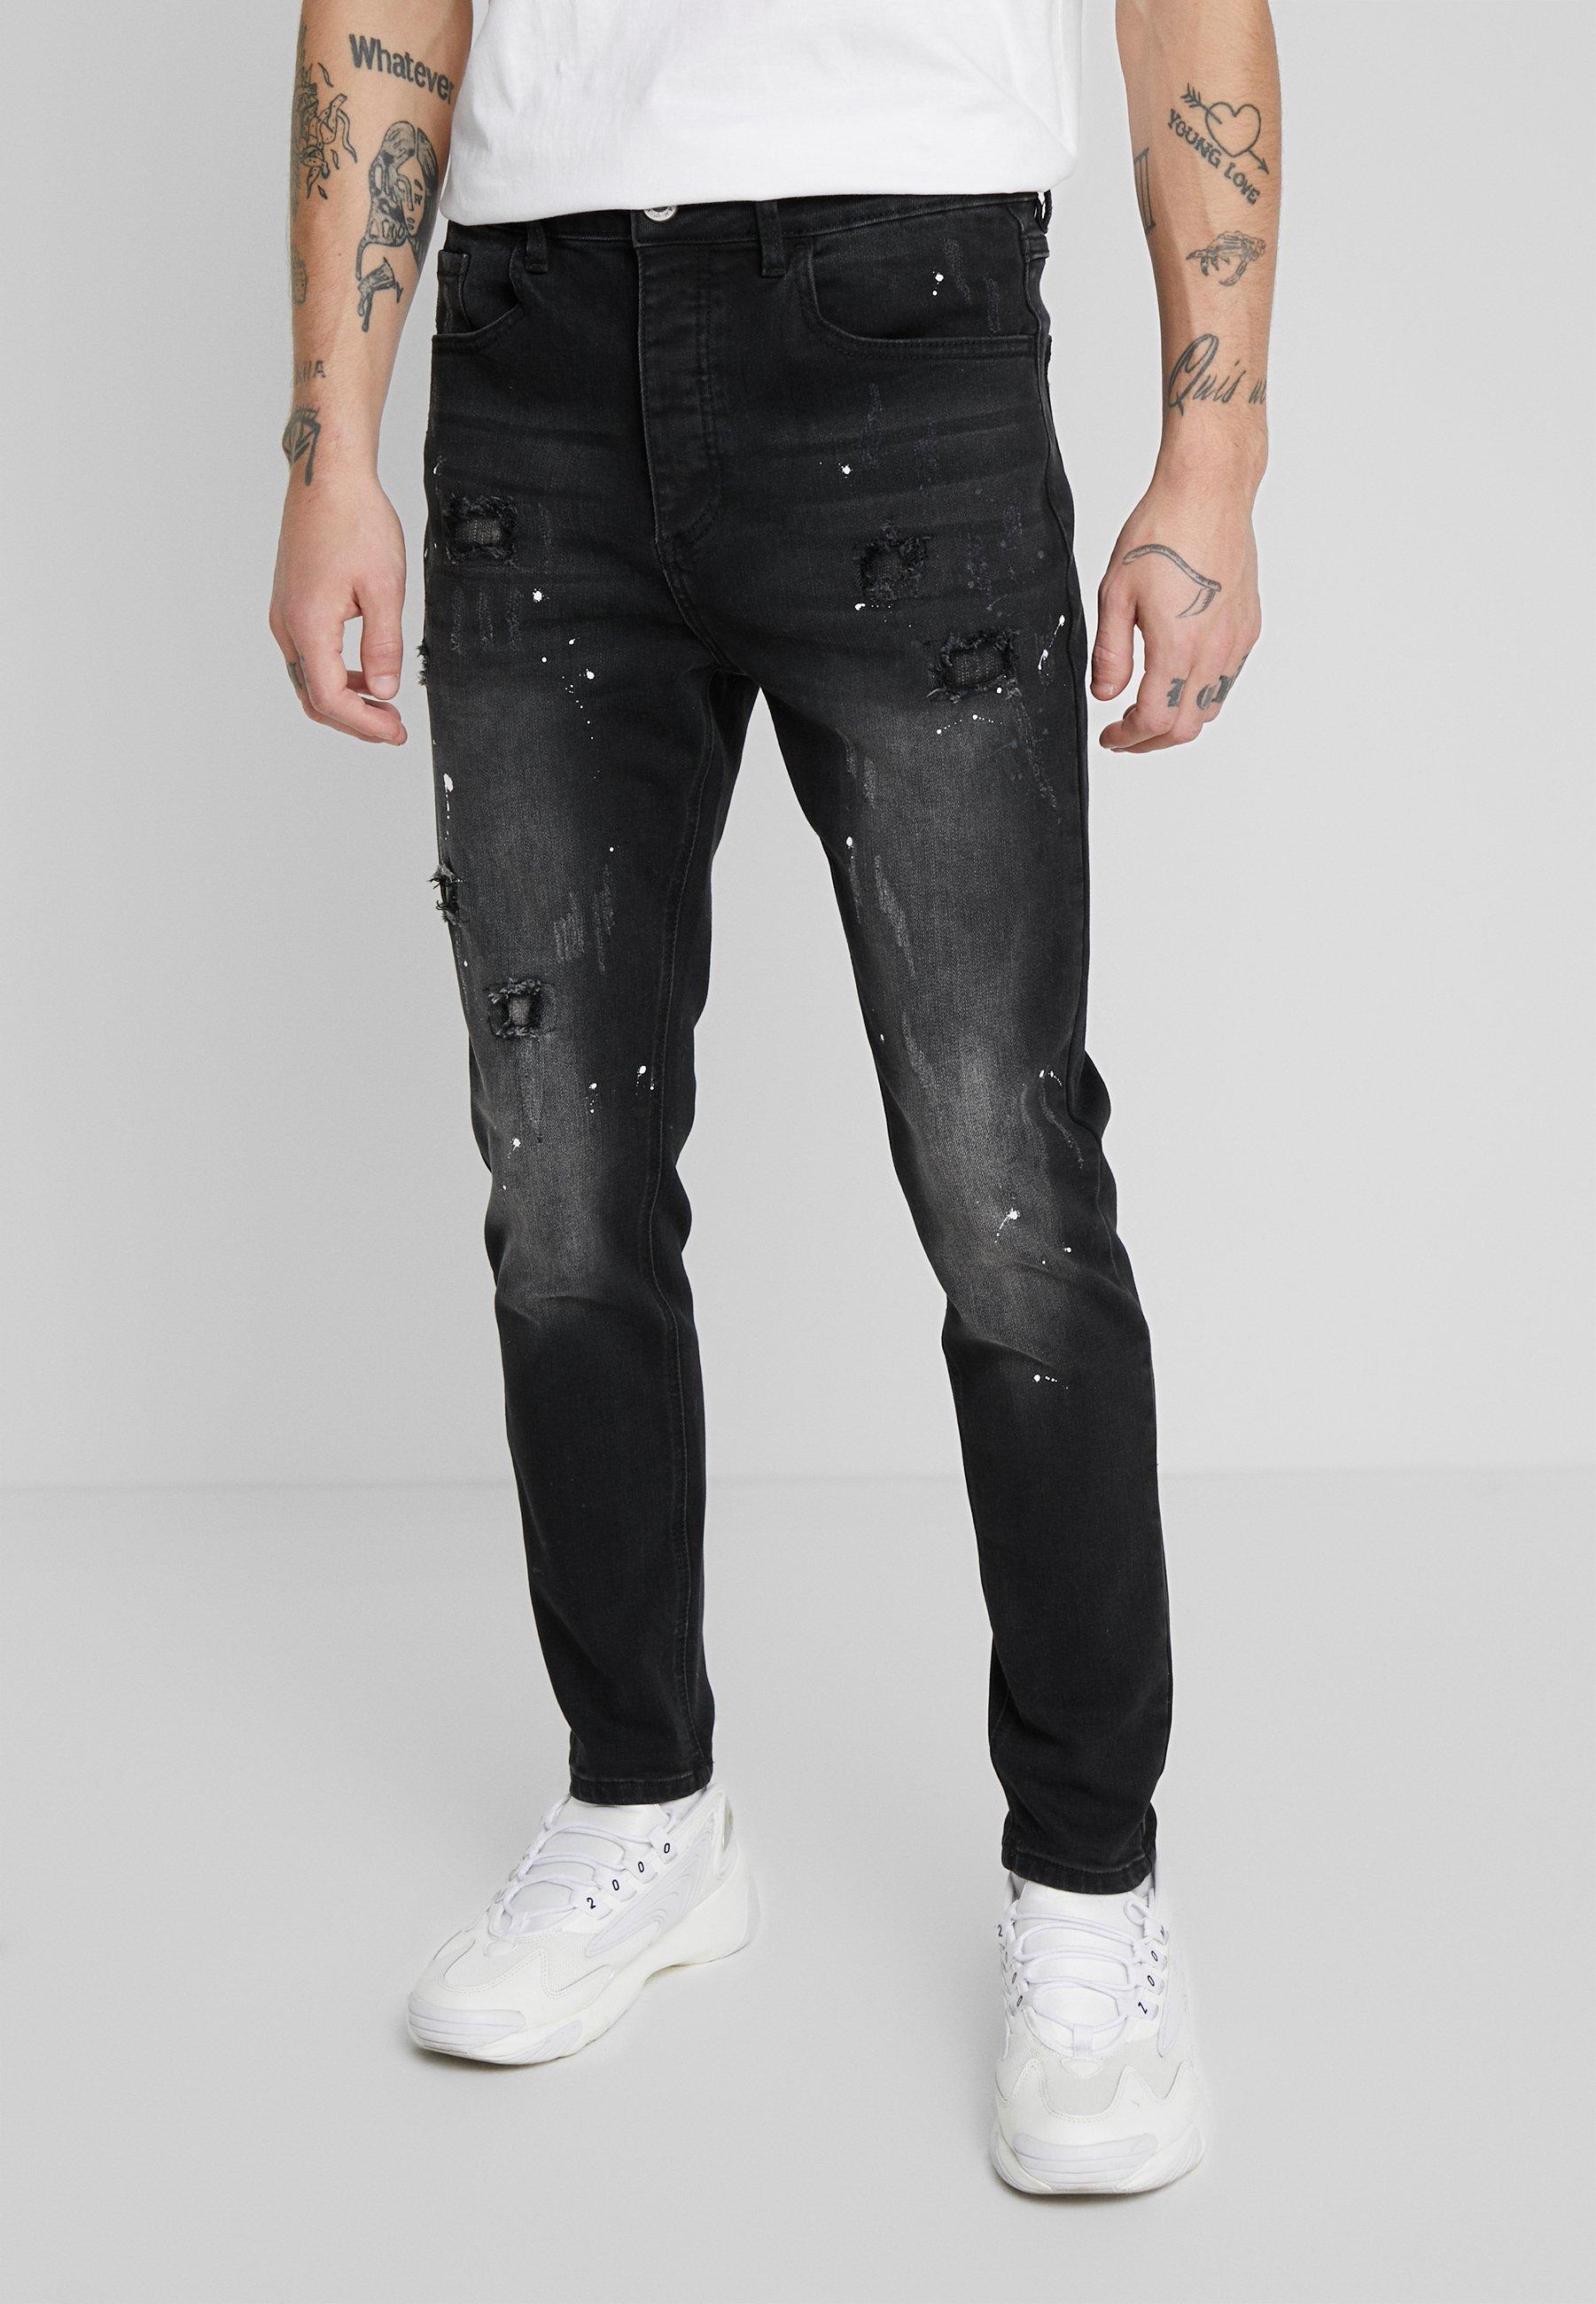 Uomo KINGS WILL DREAM ROCKET CARROT FIT JEANS  - Jeans slim fit